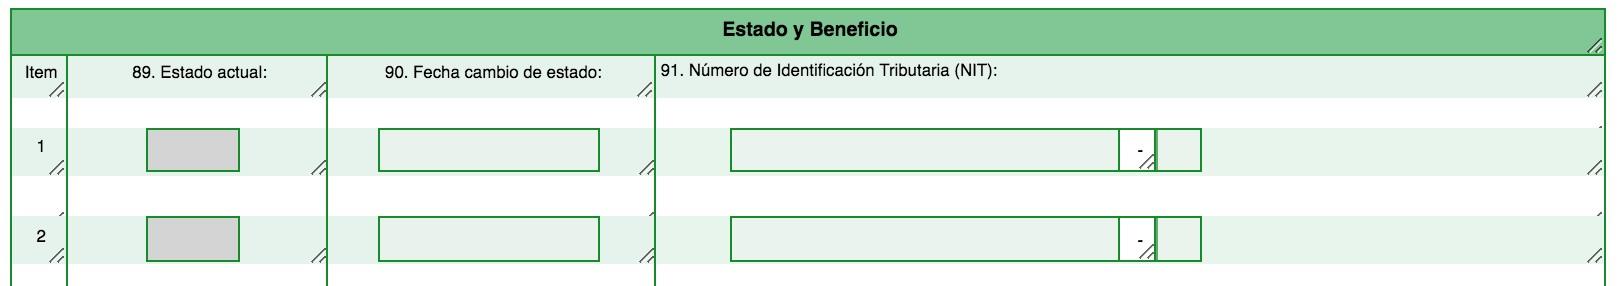 Códigos especiales en el RUT para sociedades con beneficios por Zomac, Zese o régimen CHC